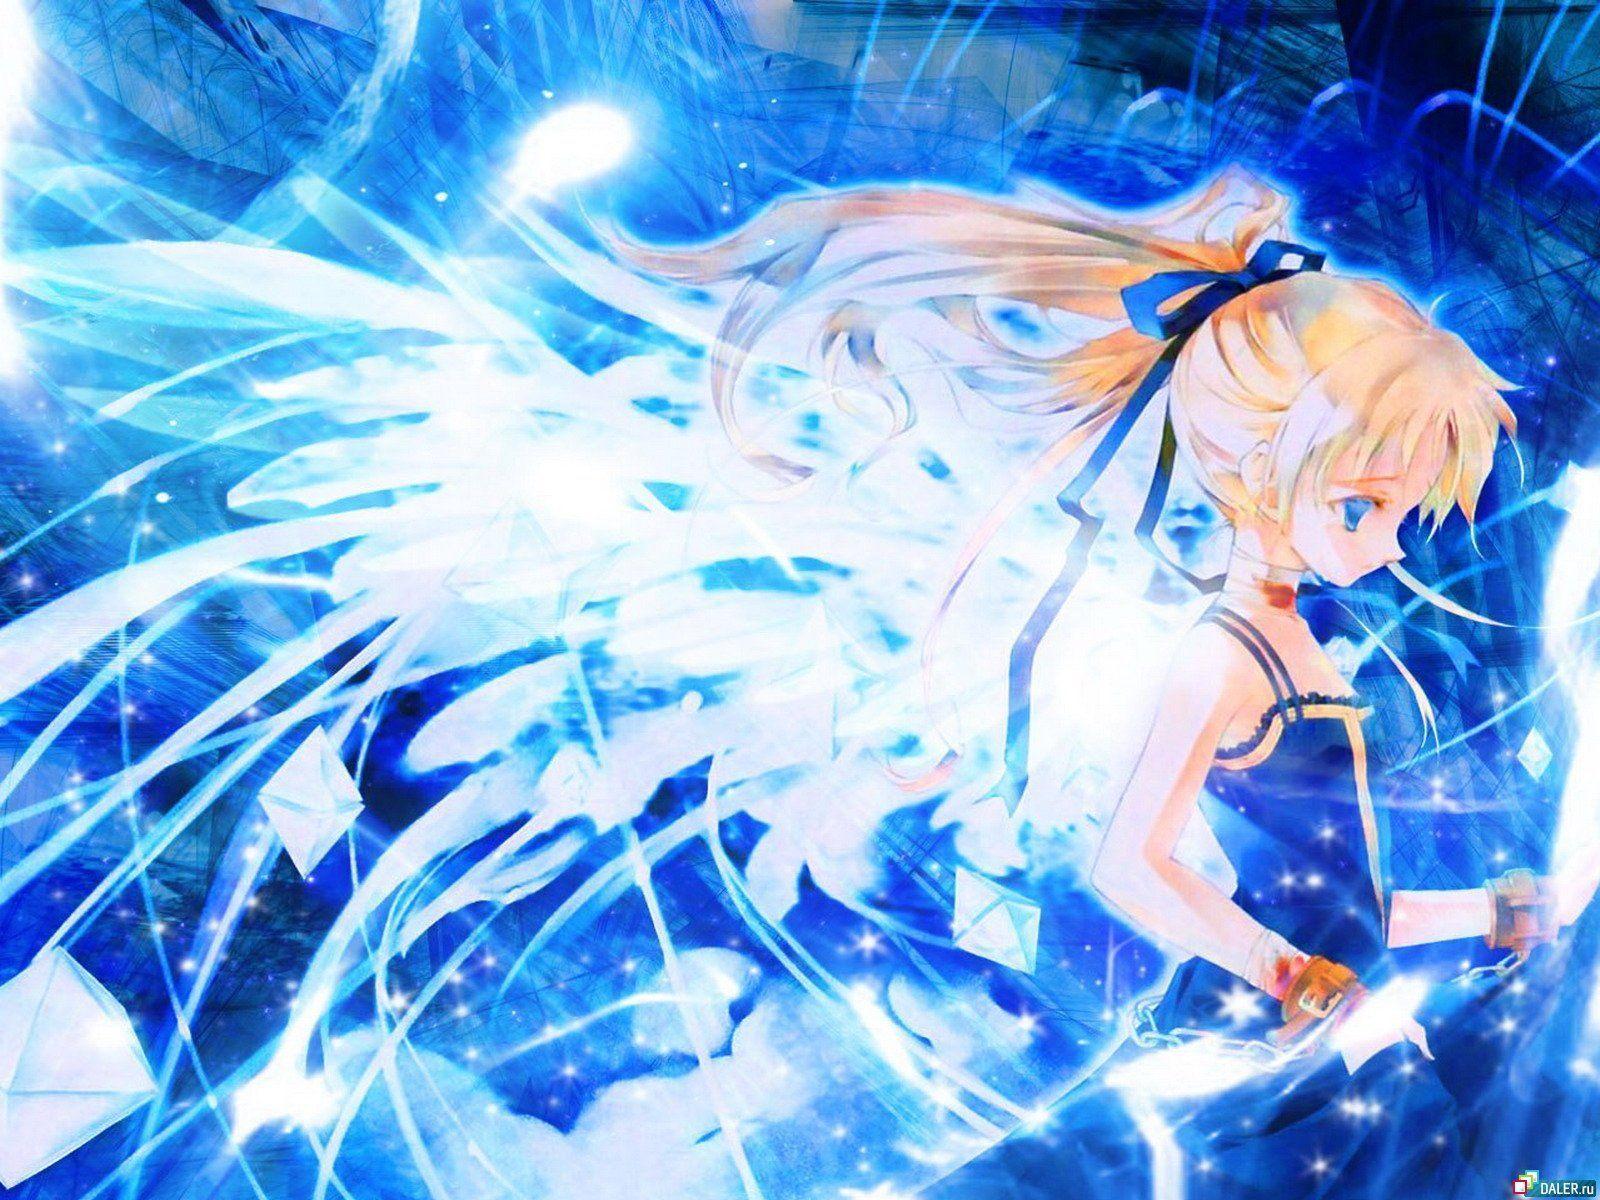 Anime Angel Wallpapers HD Download Anime, Hd anime